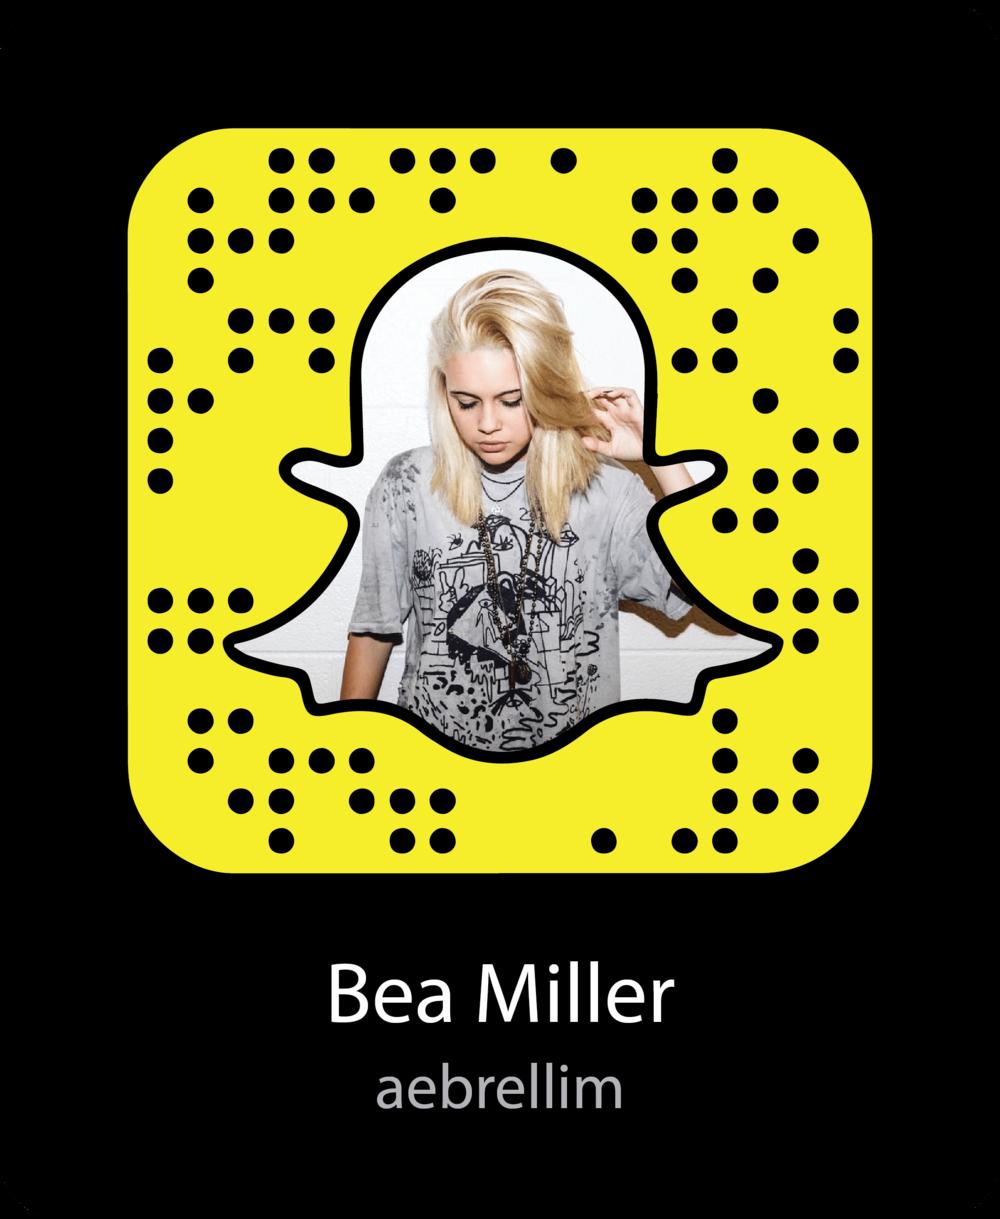 bea-miller-celebrity-snapchat-snapcode